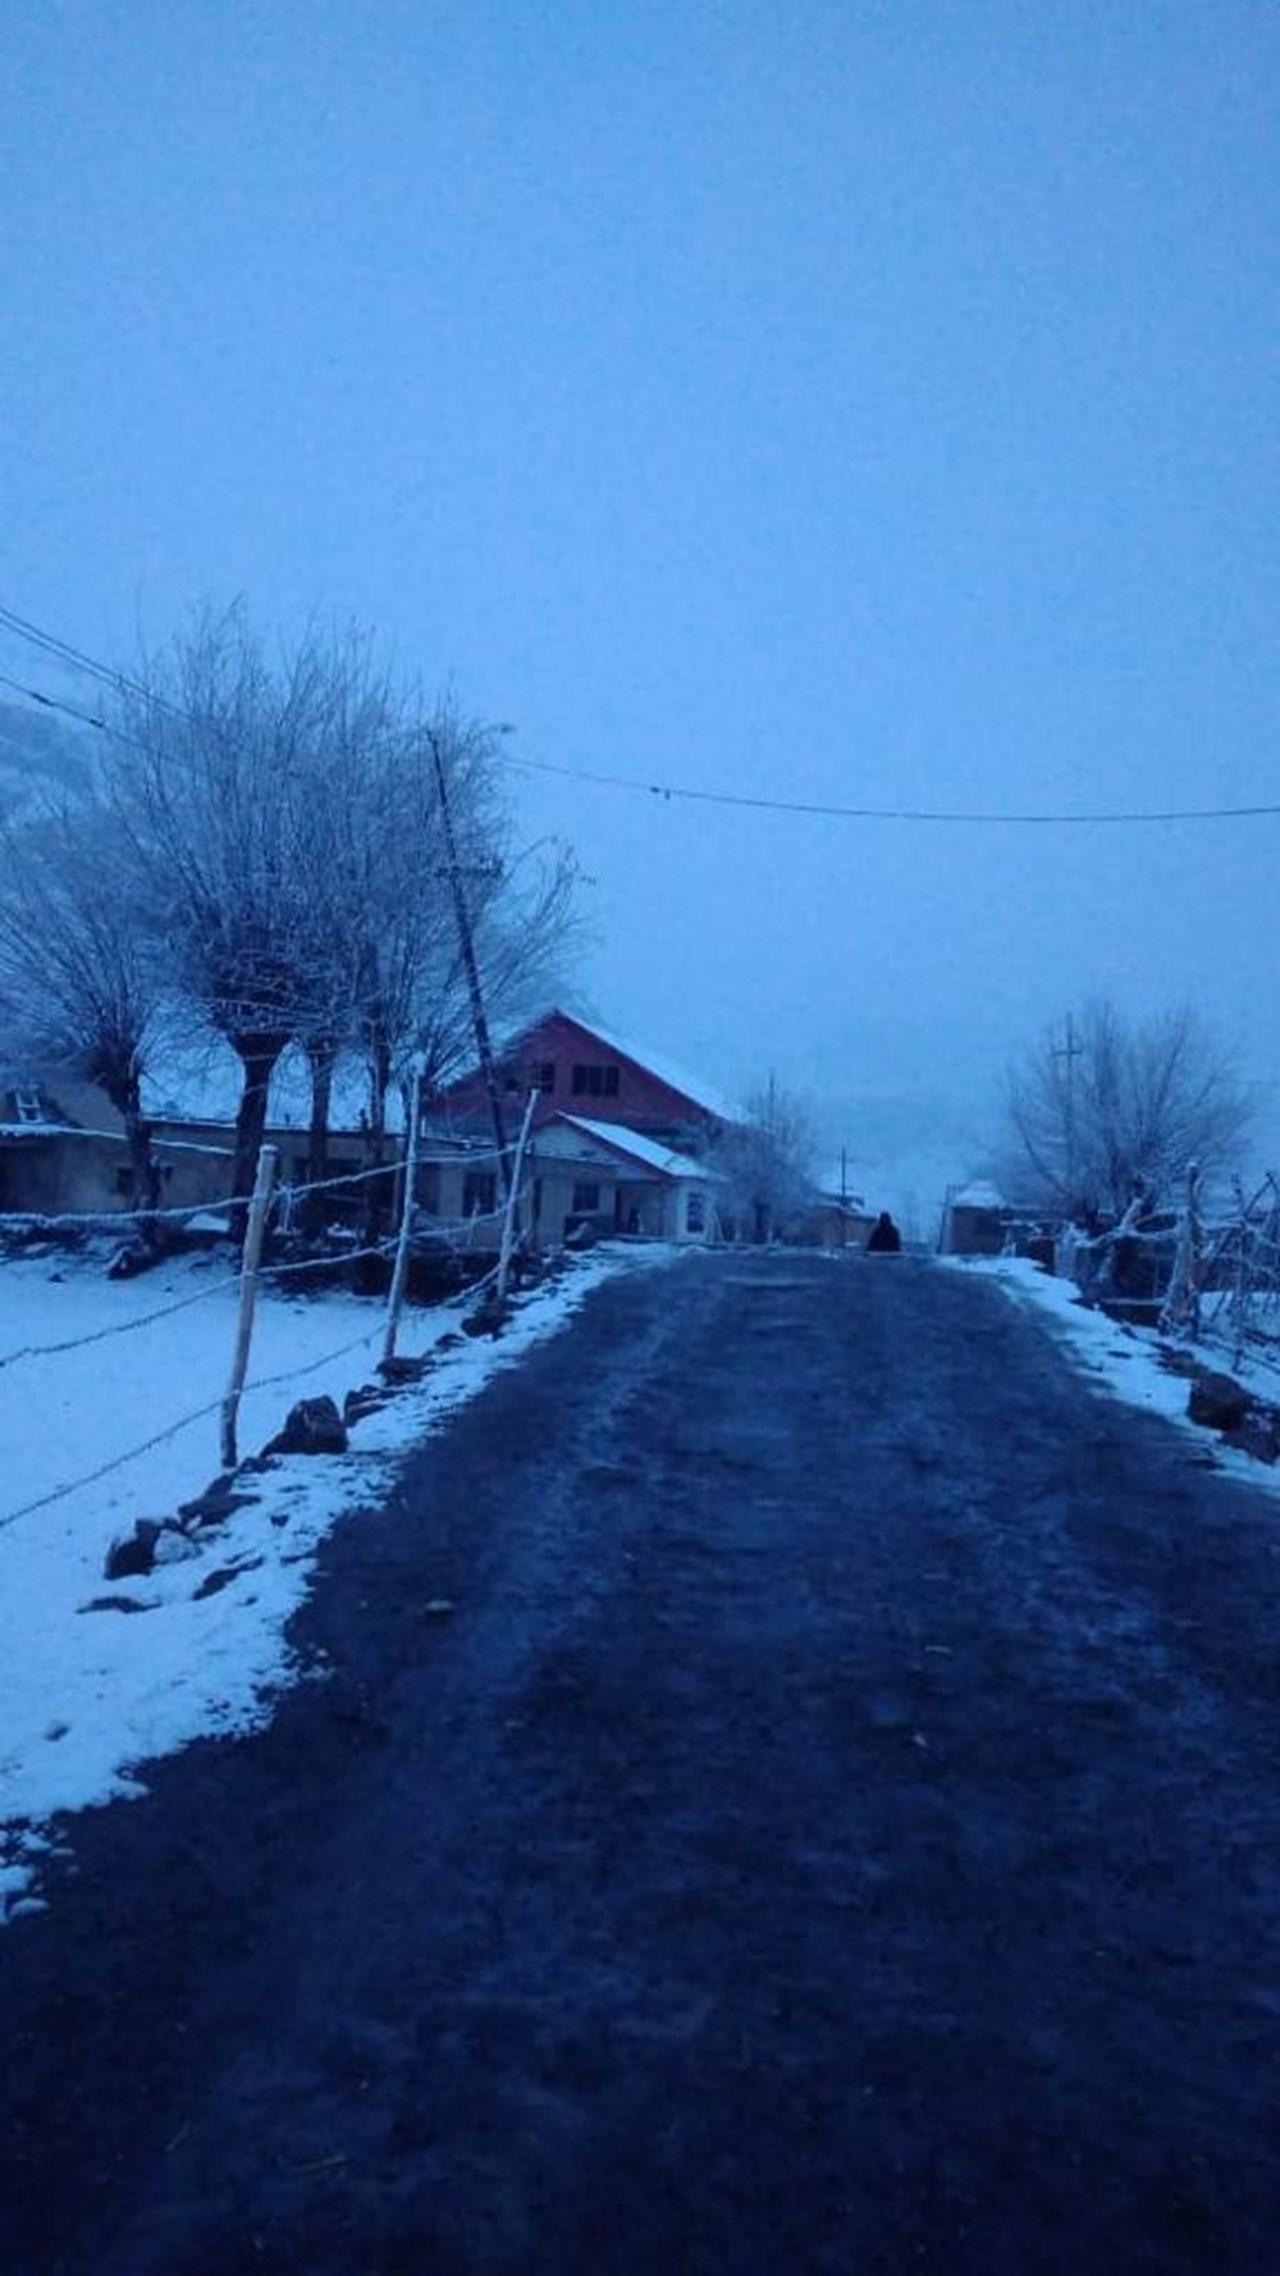 Snowfall, rains covers valley